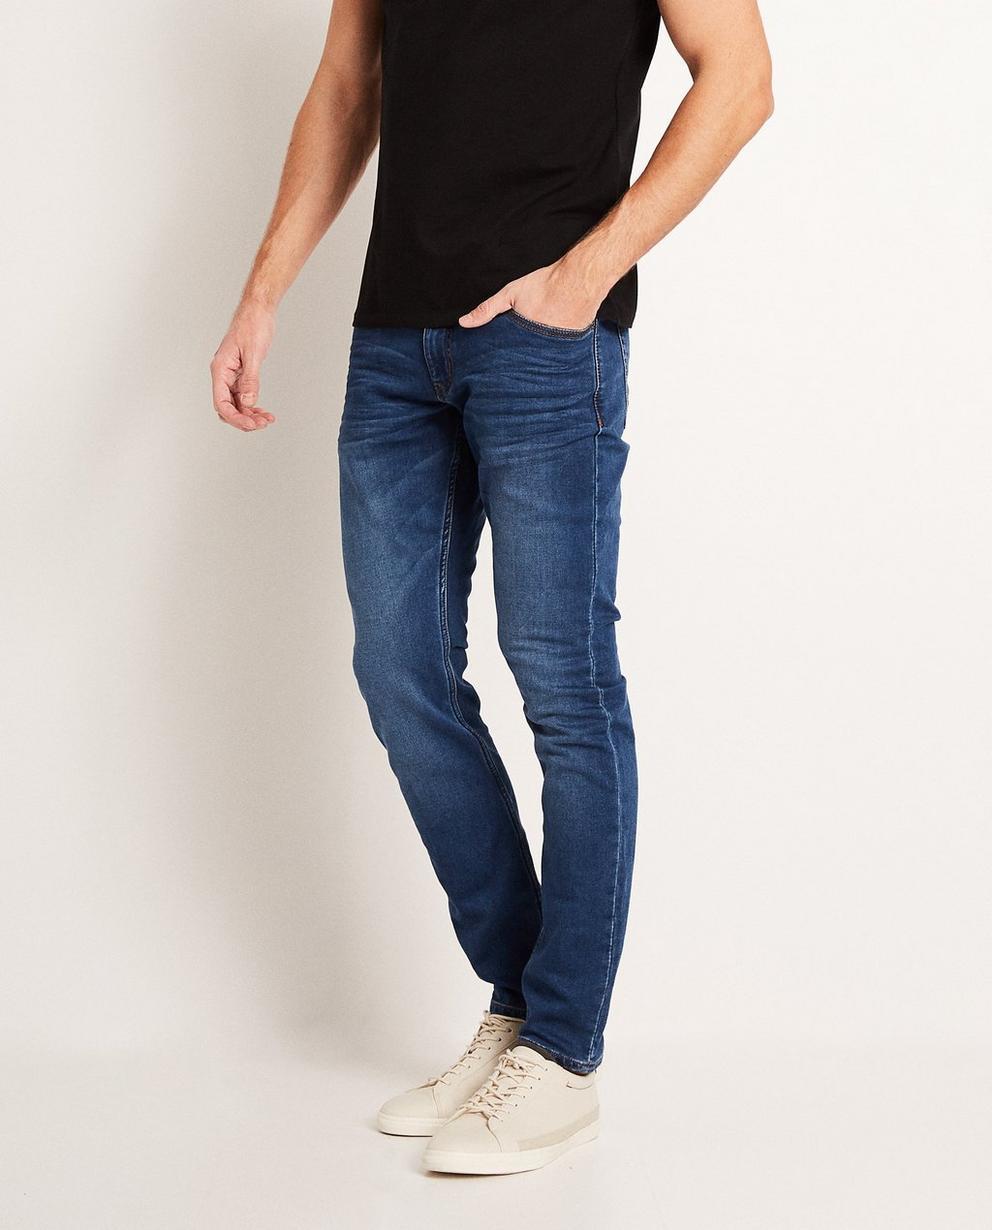 Jeans - aqua - Jeans skinny JIMMY